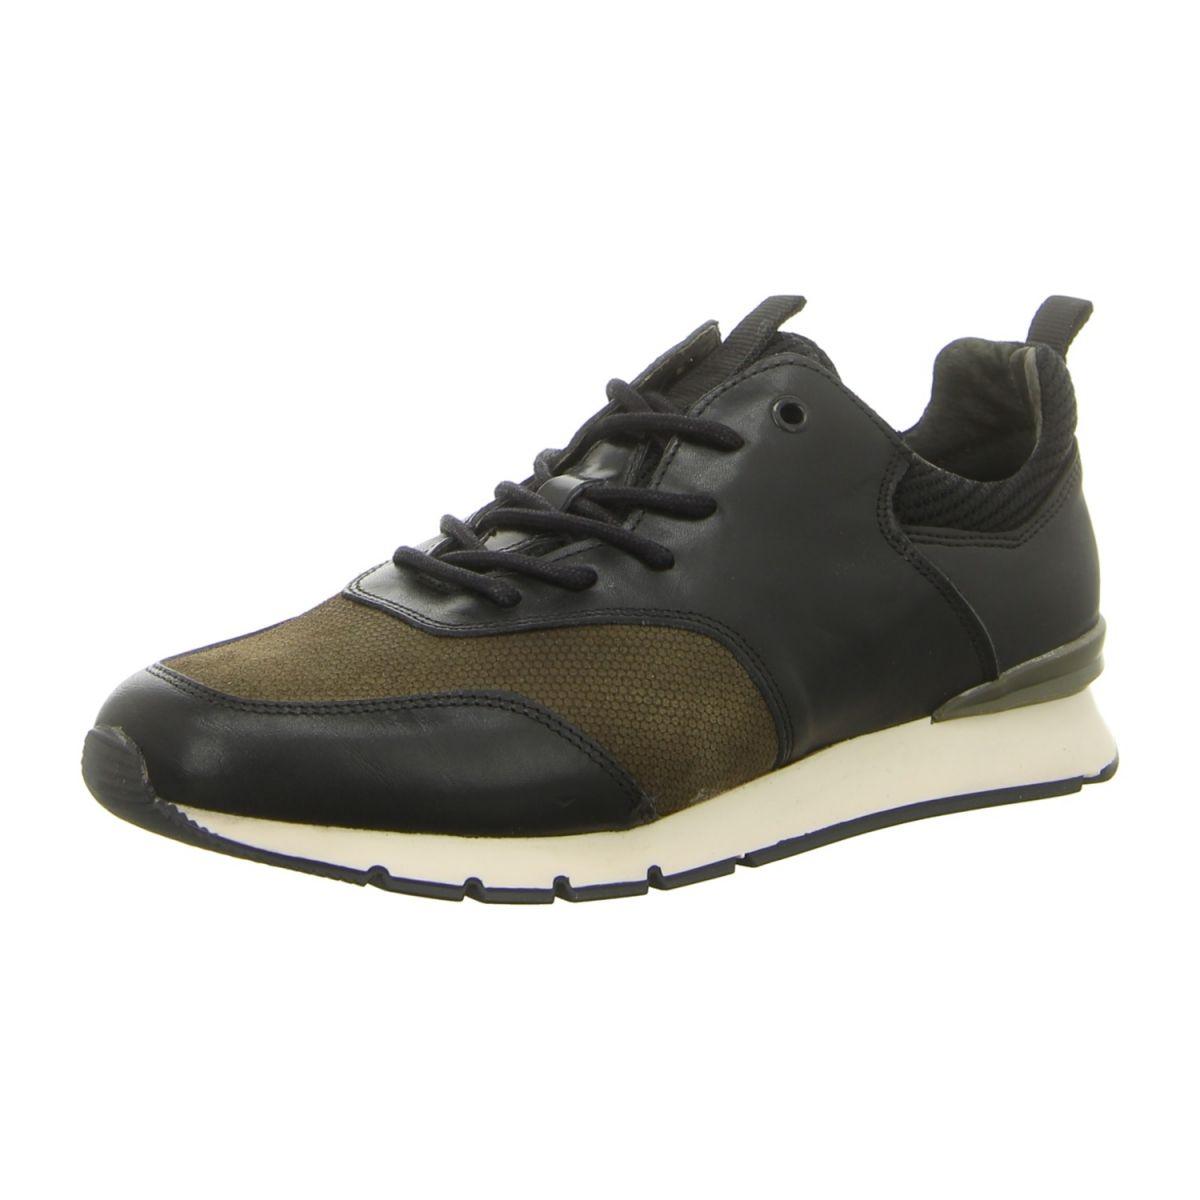 Borba 02 100 Black Mmonterey Sneaker NeuCoxx eWYDE9IH2